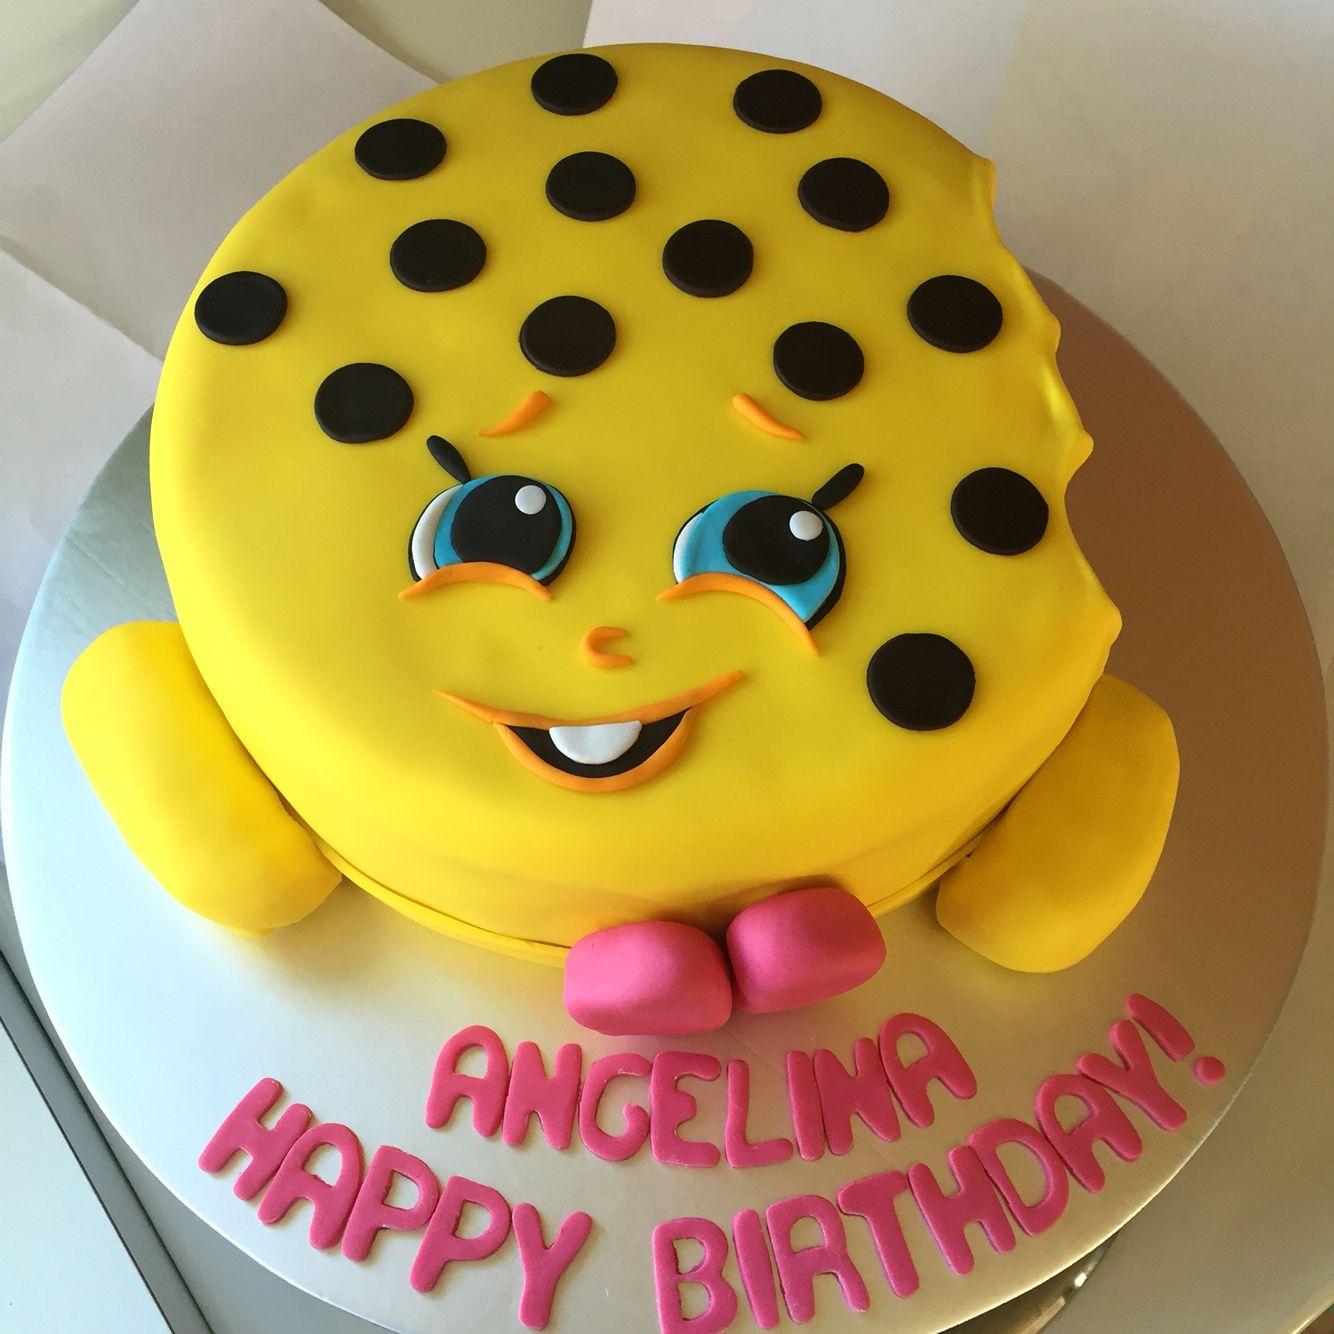 Kooky Cokkie Shopkins Moose Birthday Cake Birthday Cake Ideas